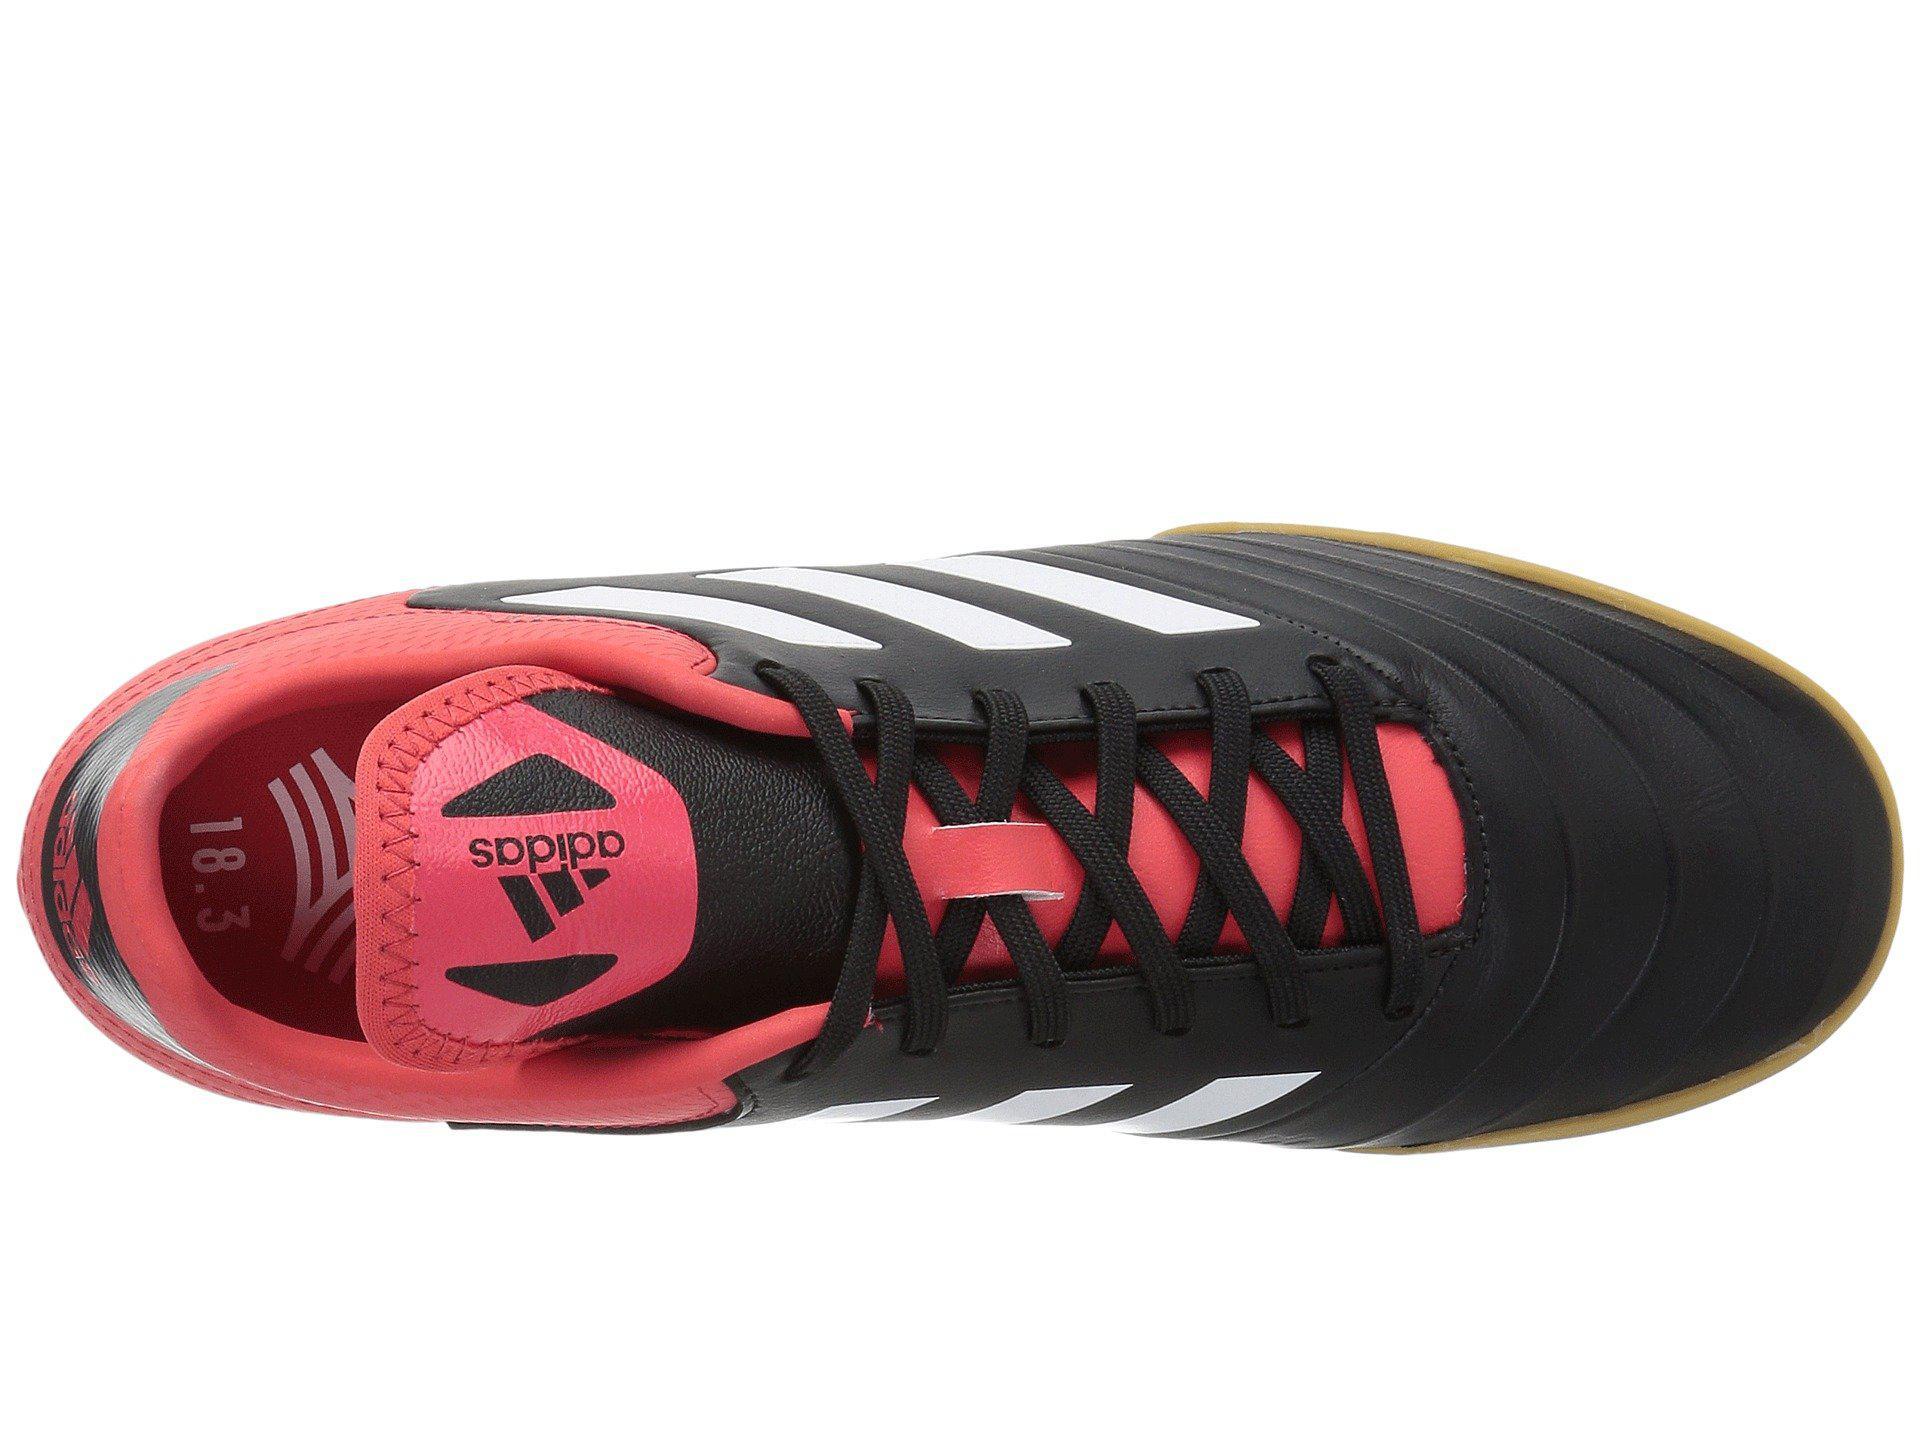 c616a48c316 Adidas - Multicolor Copa Tango 18.3 Indoor (black white real Coral) Men s.  View fullscreen